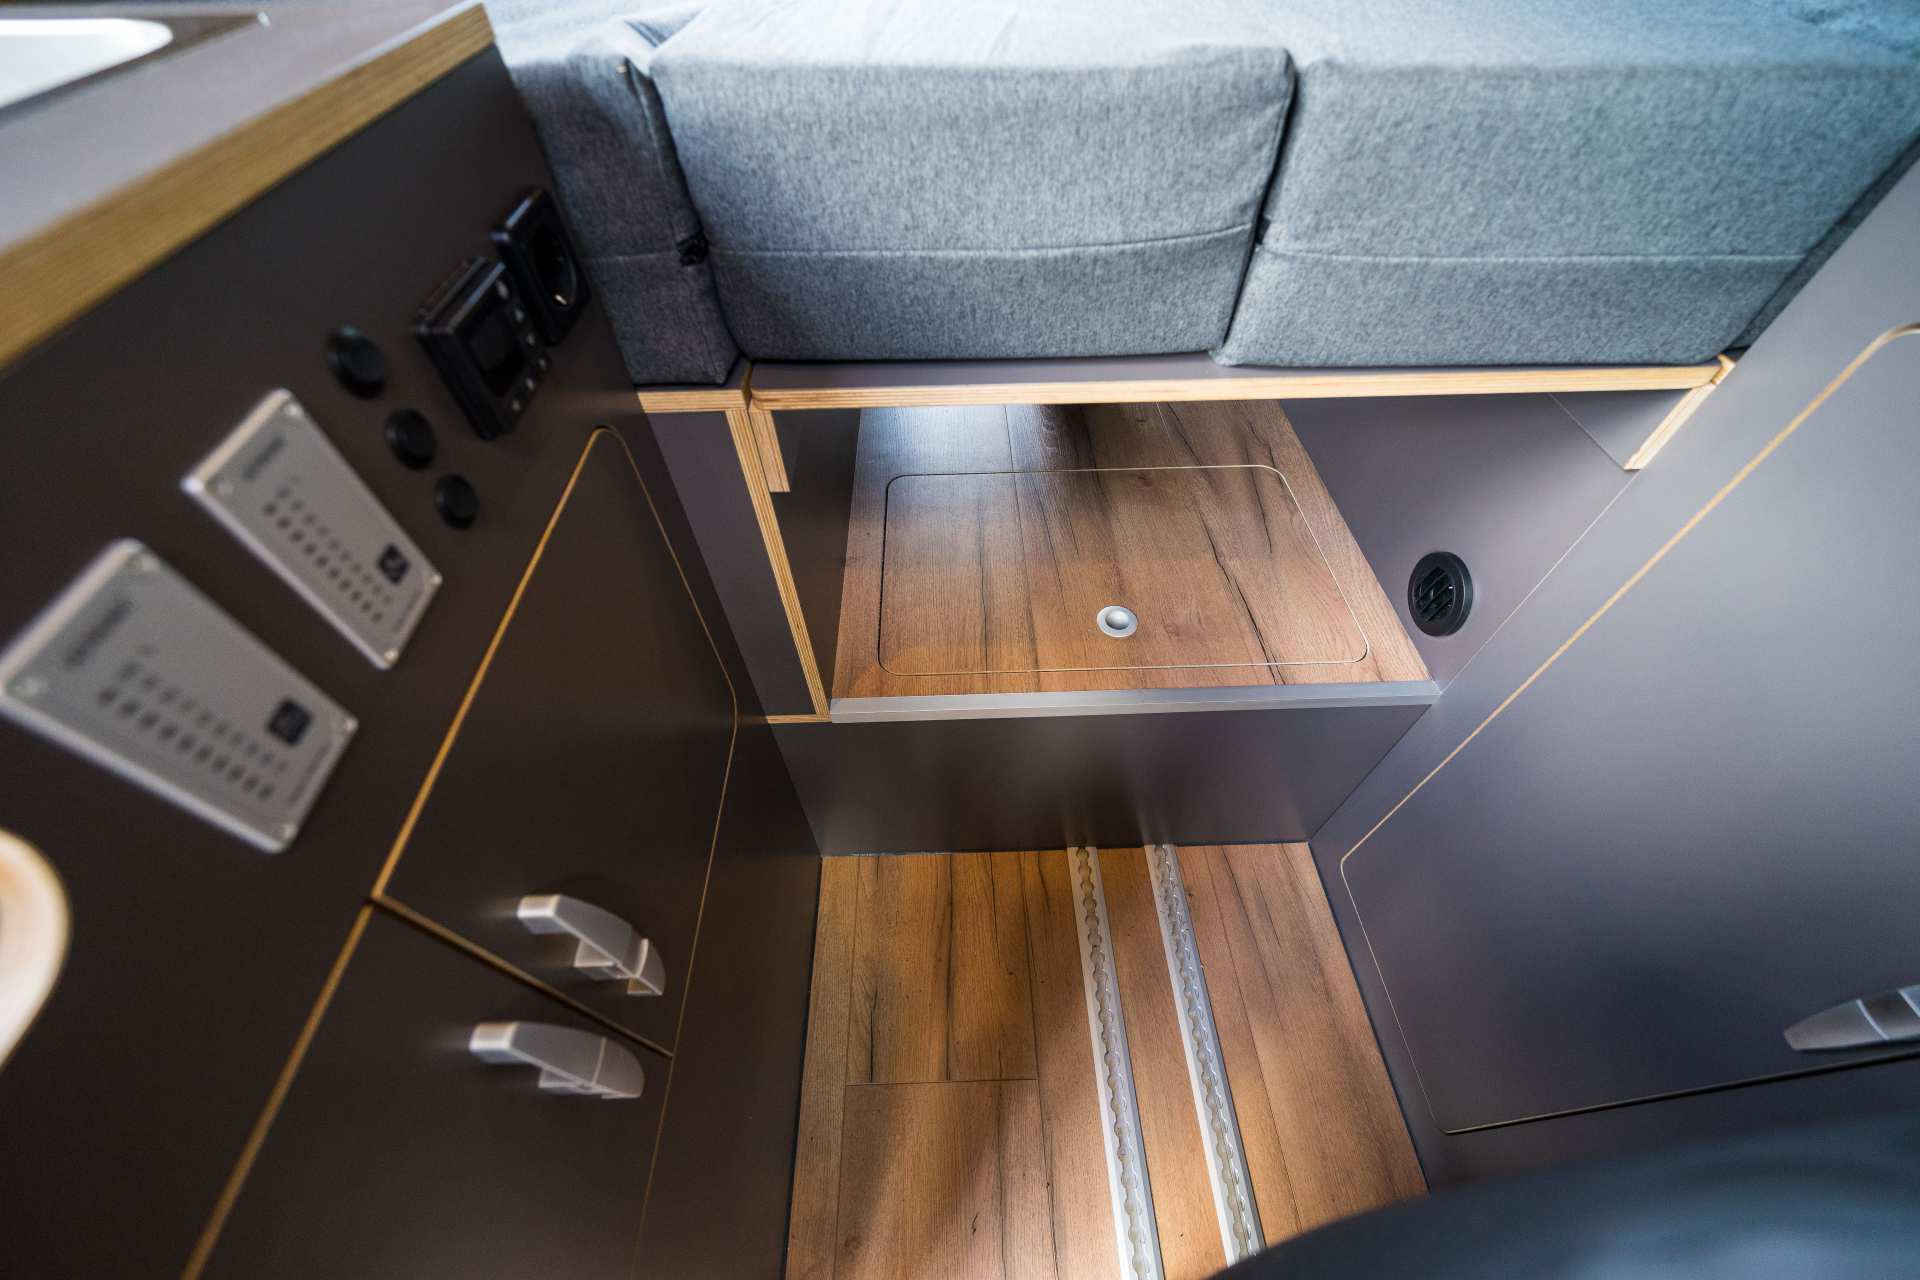 Individualausbau: Zwei-Raumwohnung Peugeot Boxer L2 H2 - 35